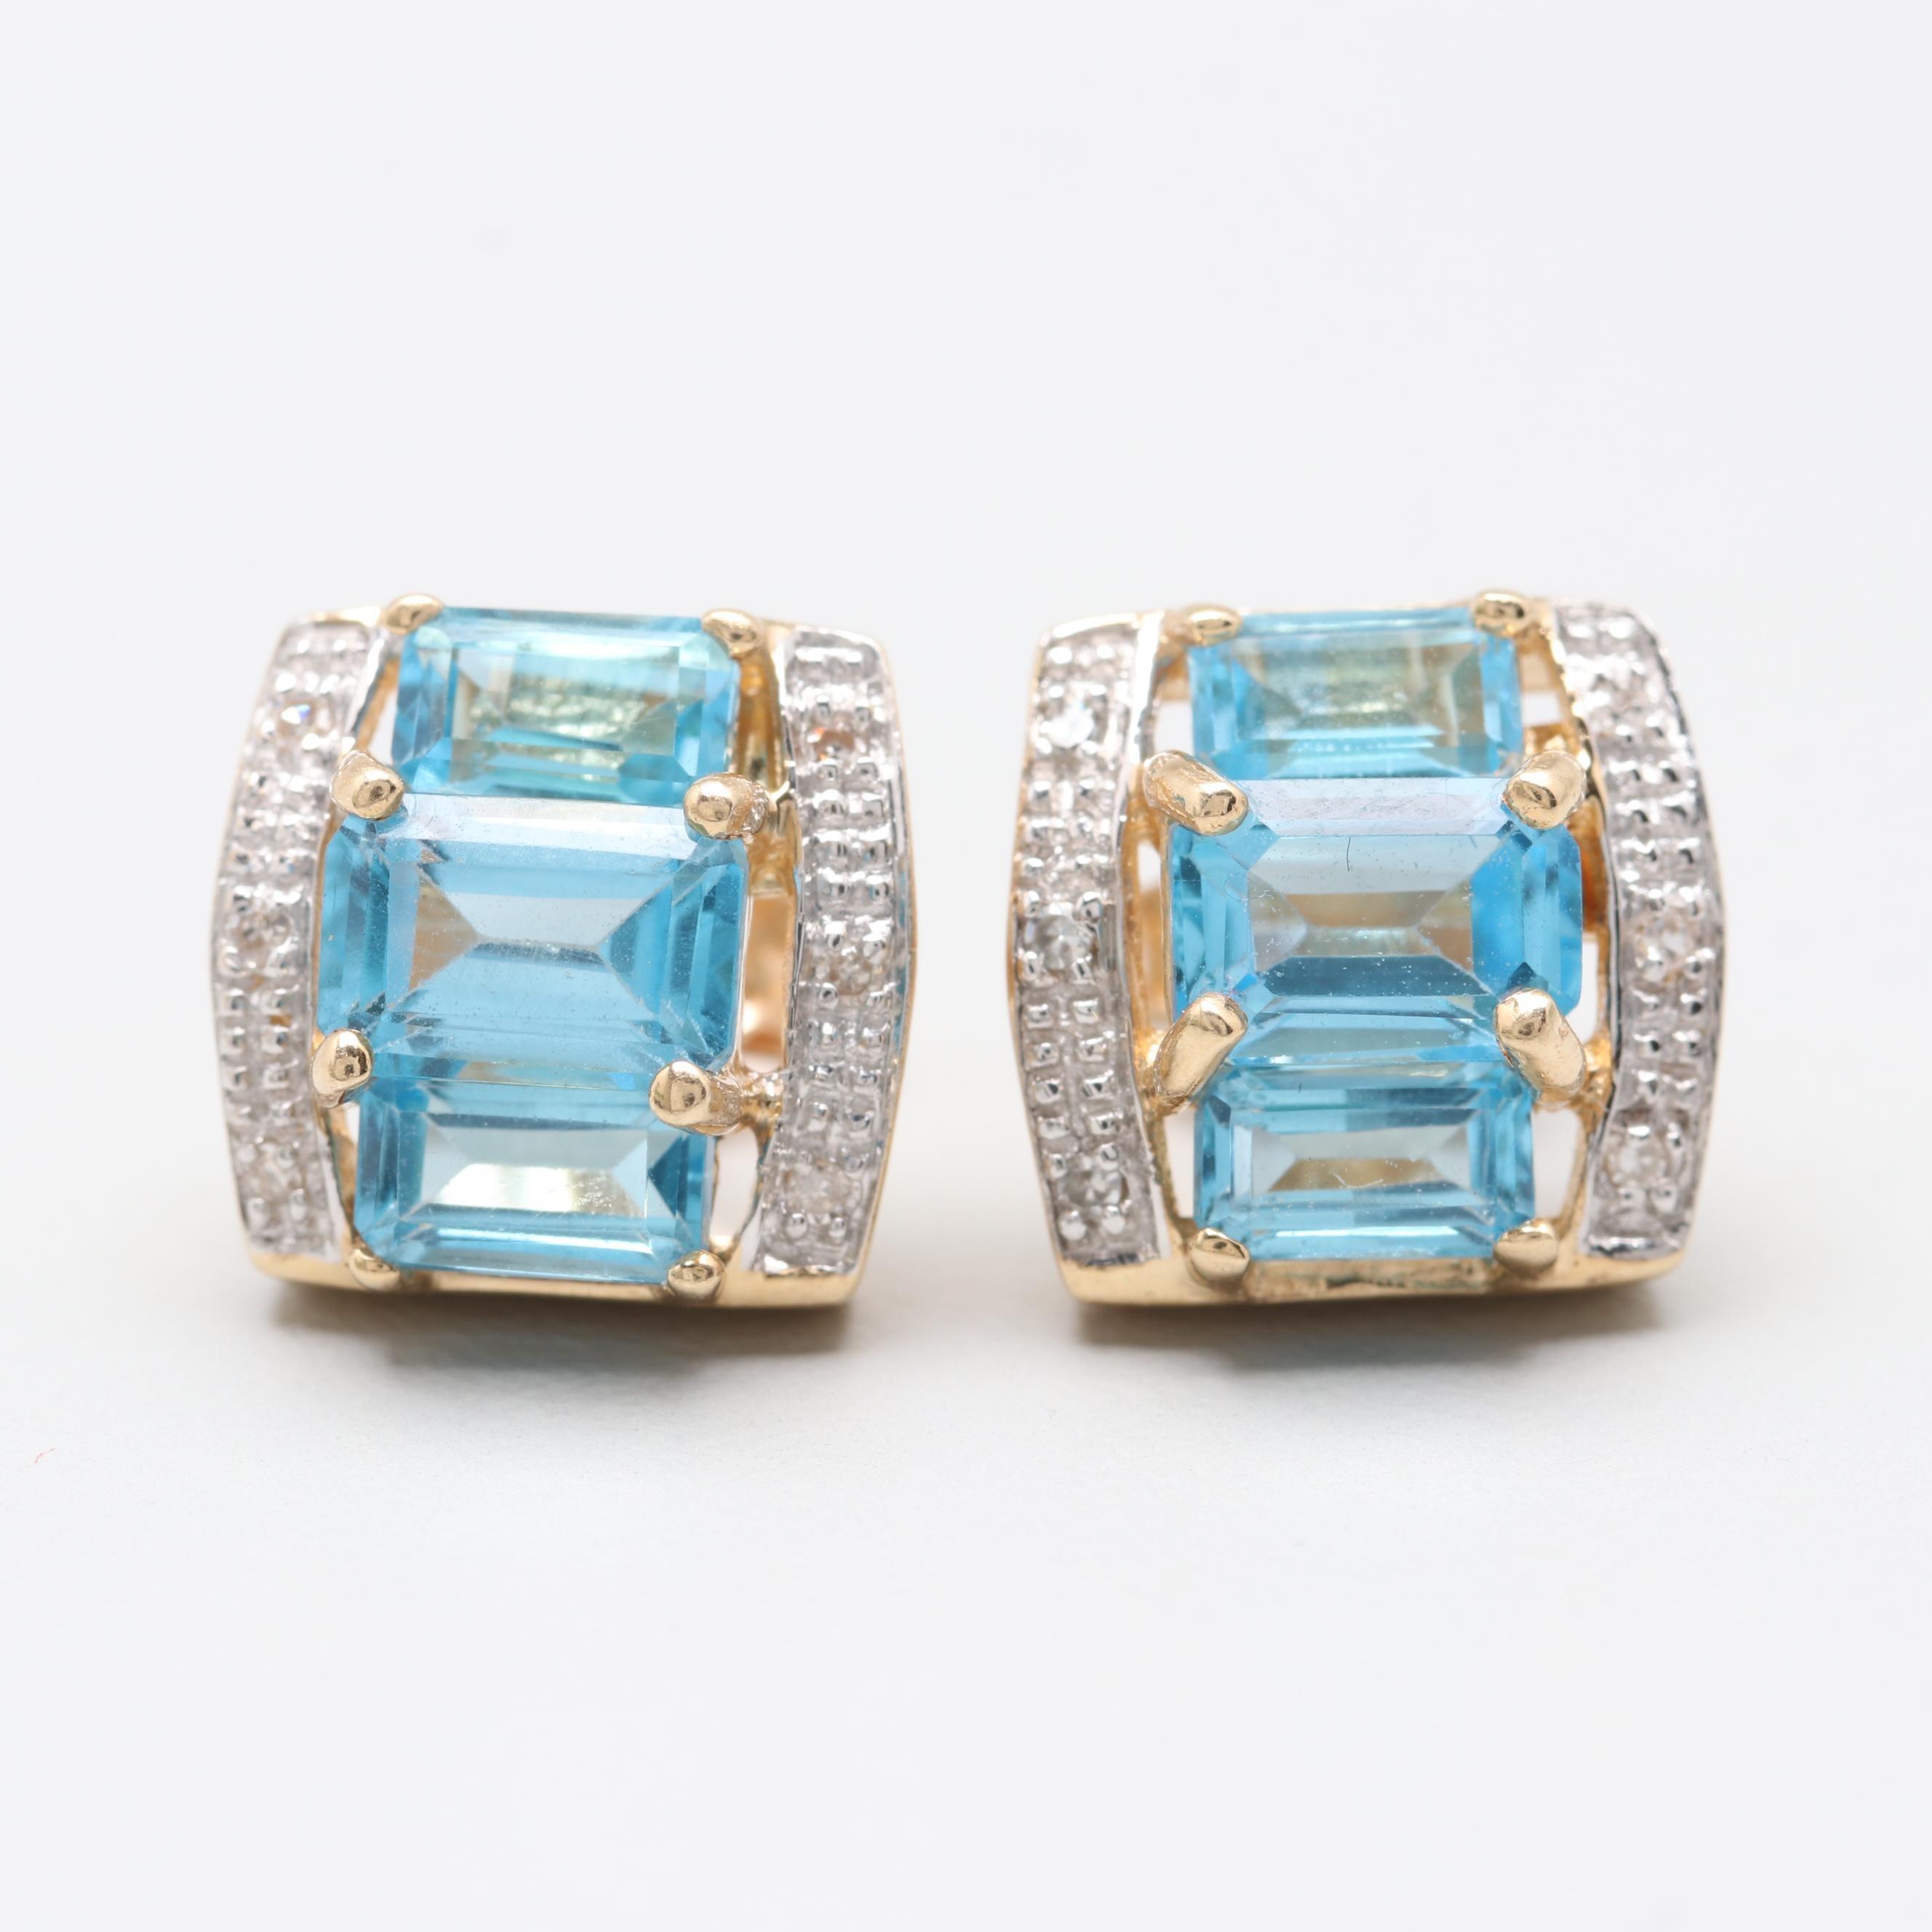 14K Yellow Gold Blue Topaz and Diamond Earrings